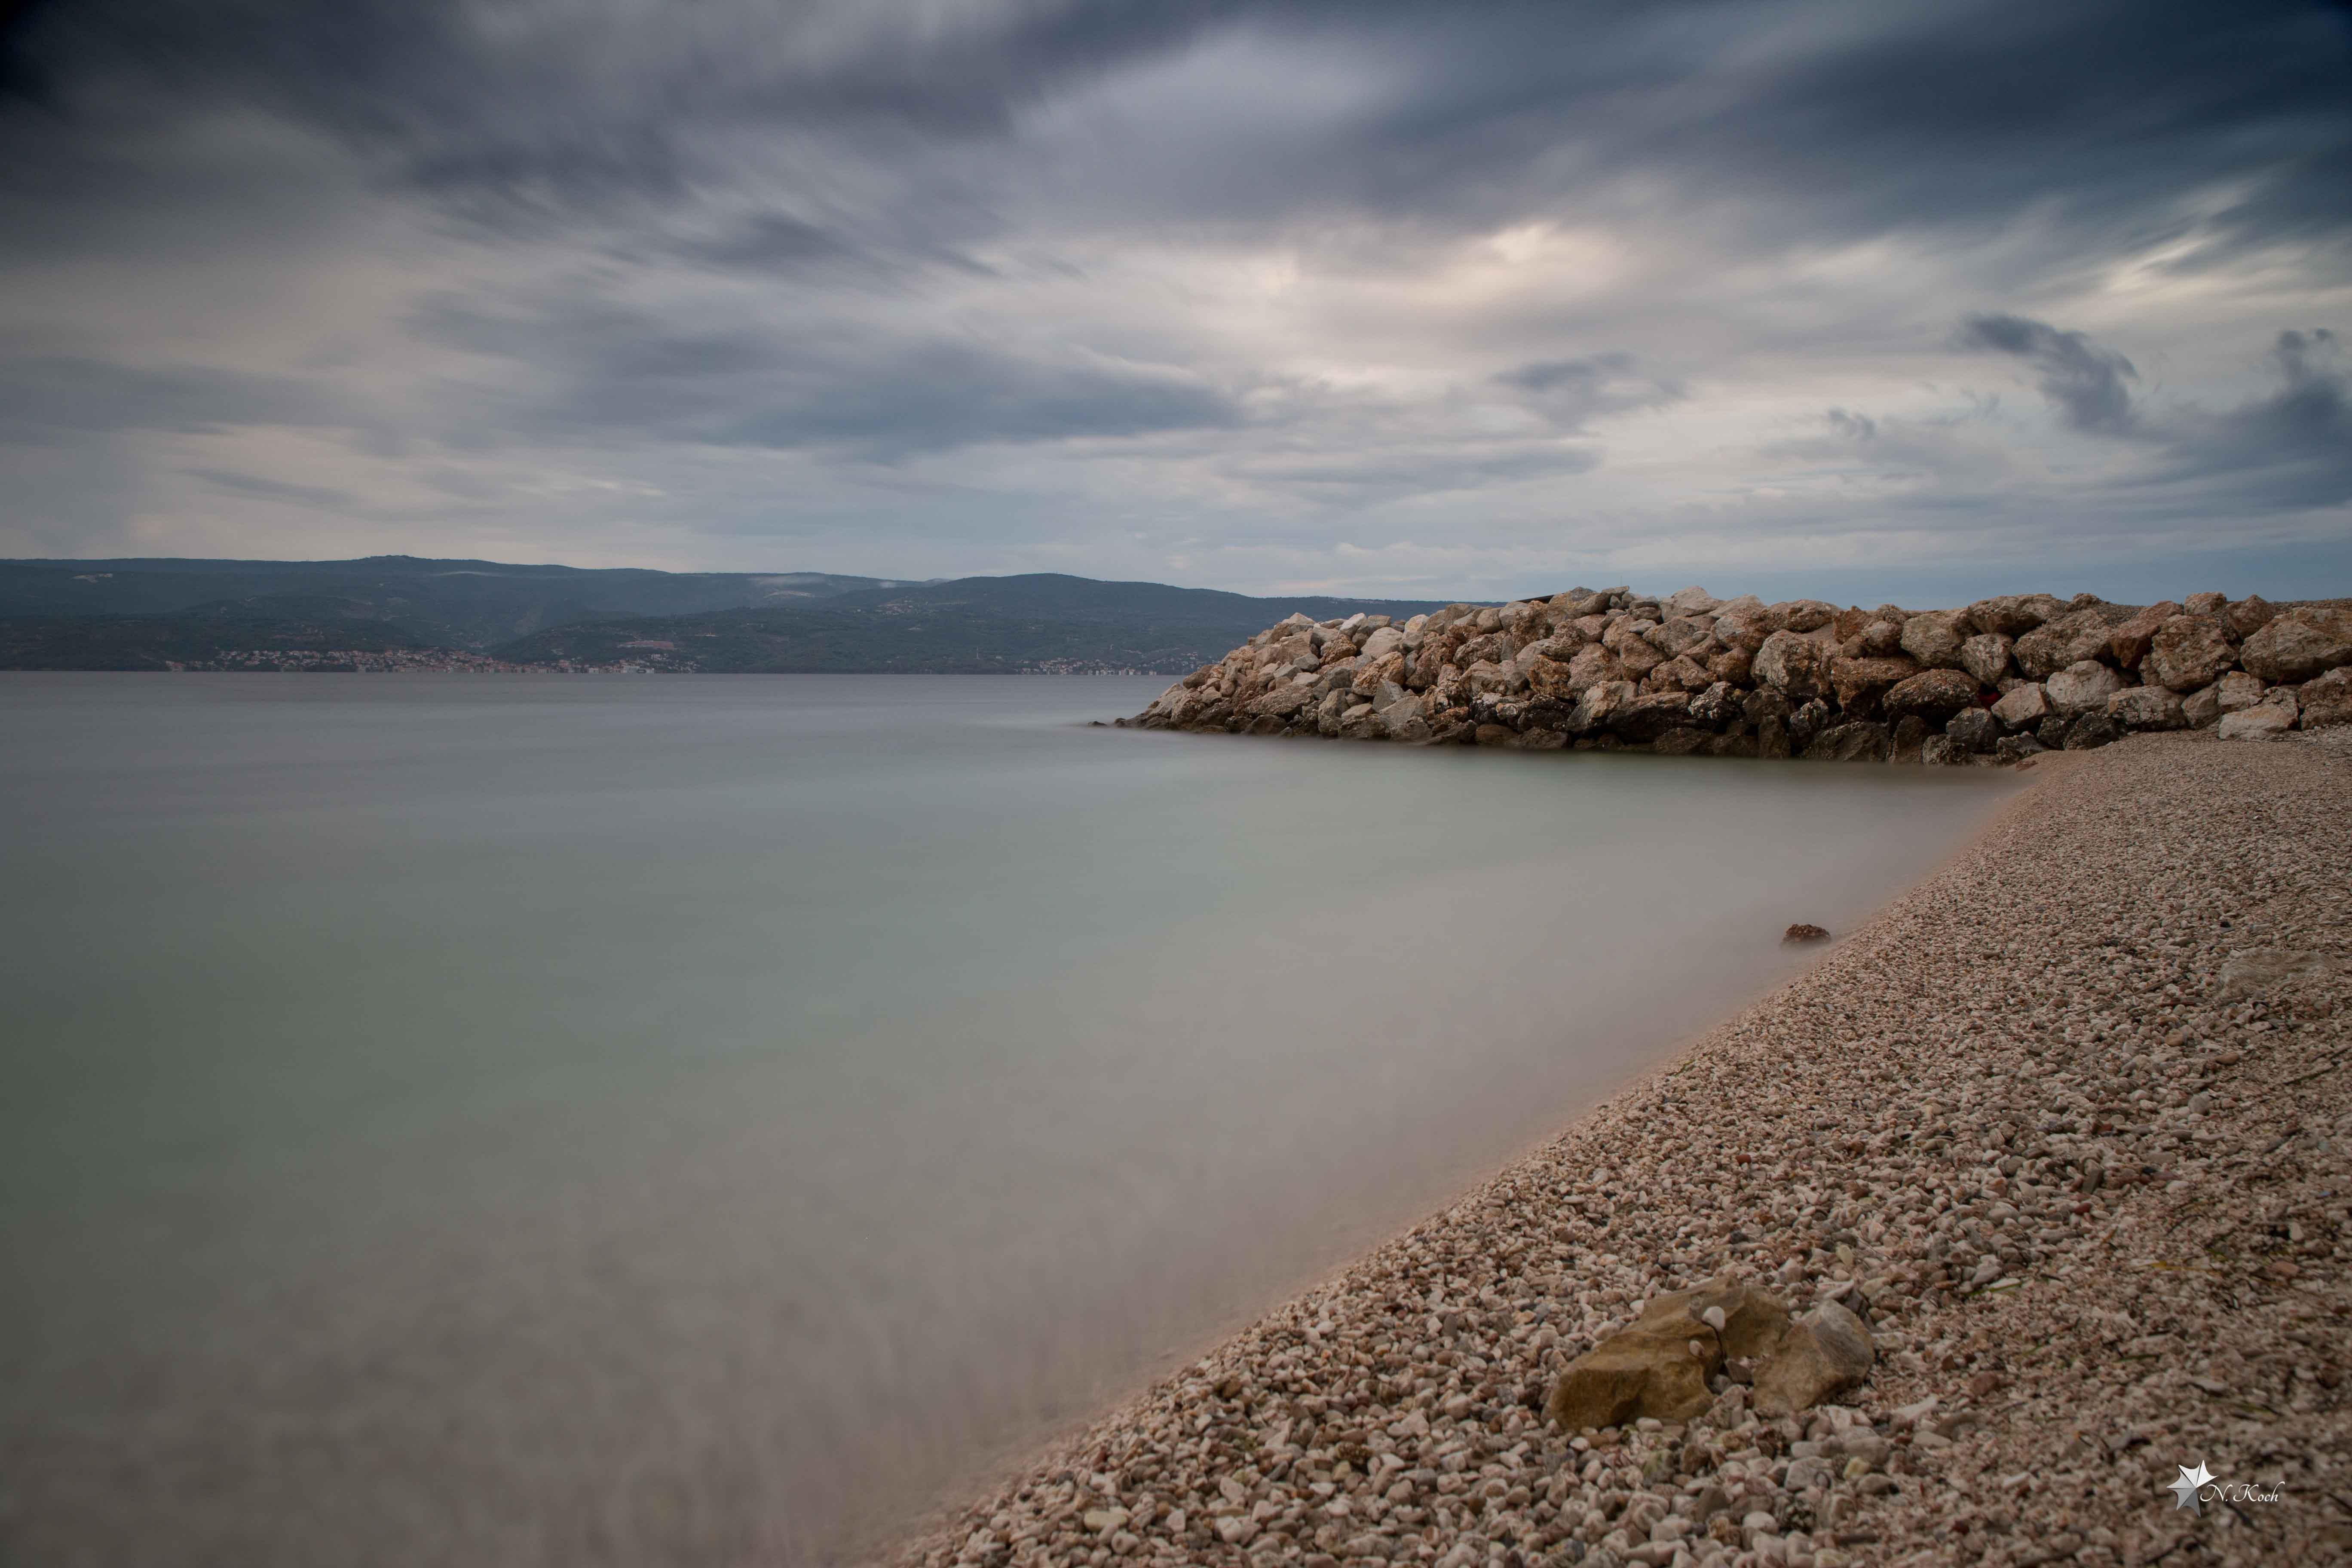 2015, Croatia | A beach near Split